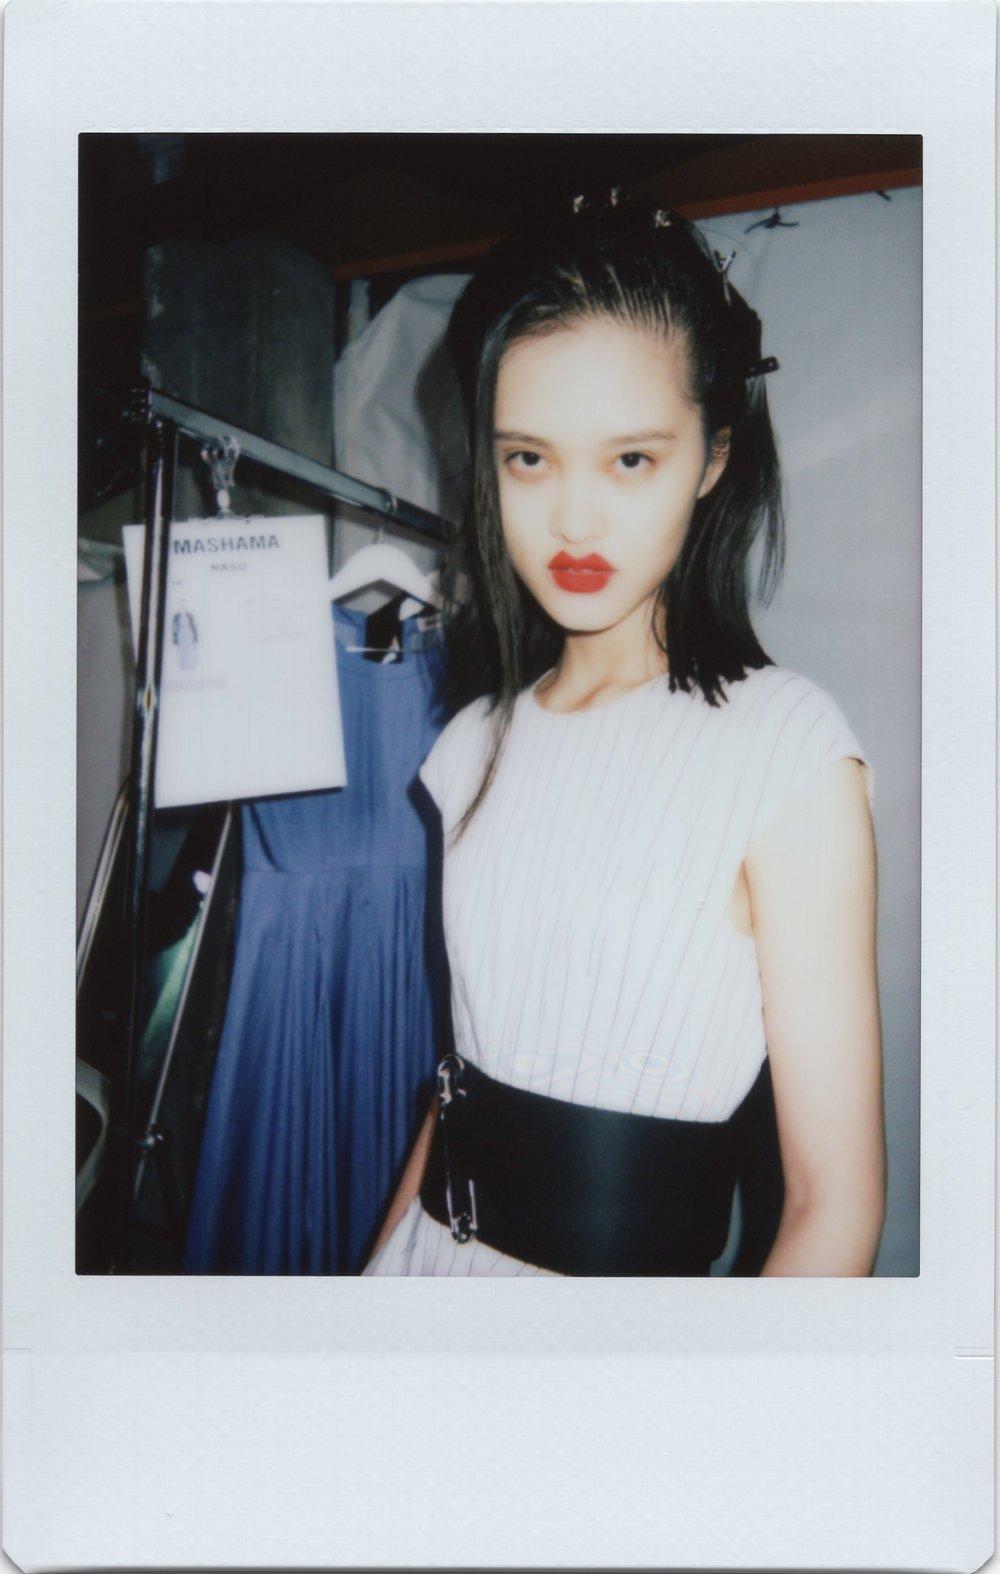 Mashama_Honigschreck_Backstage_Polaroid_3.jpg